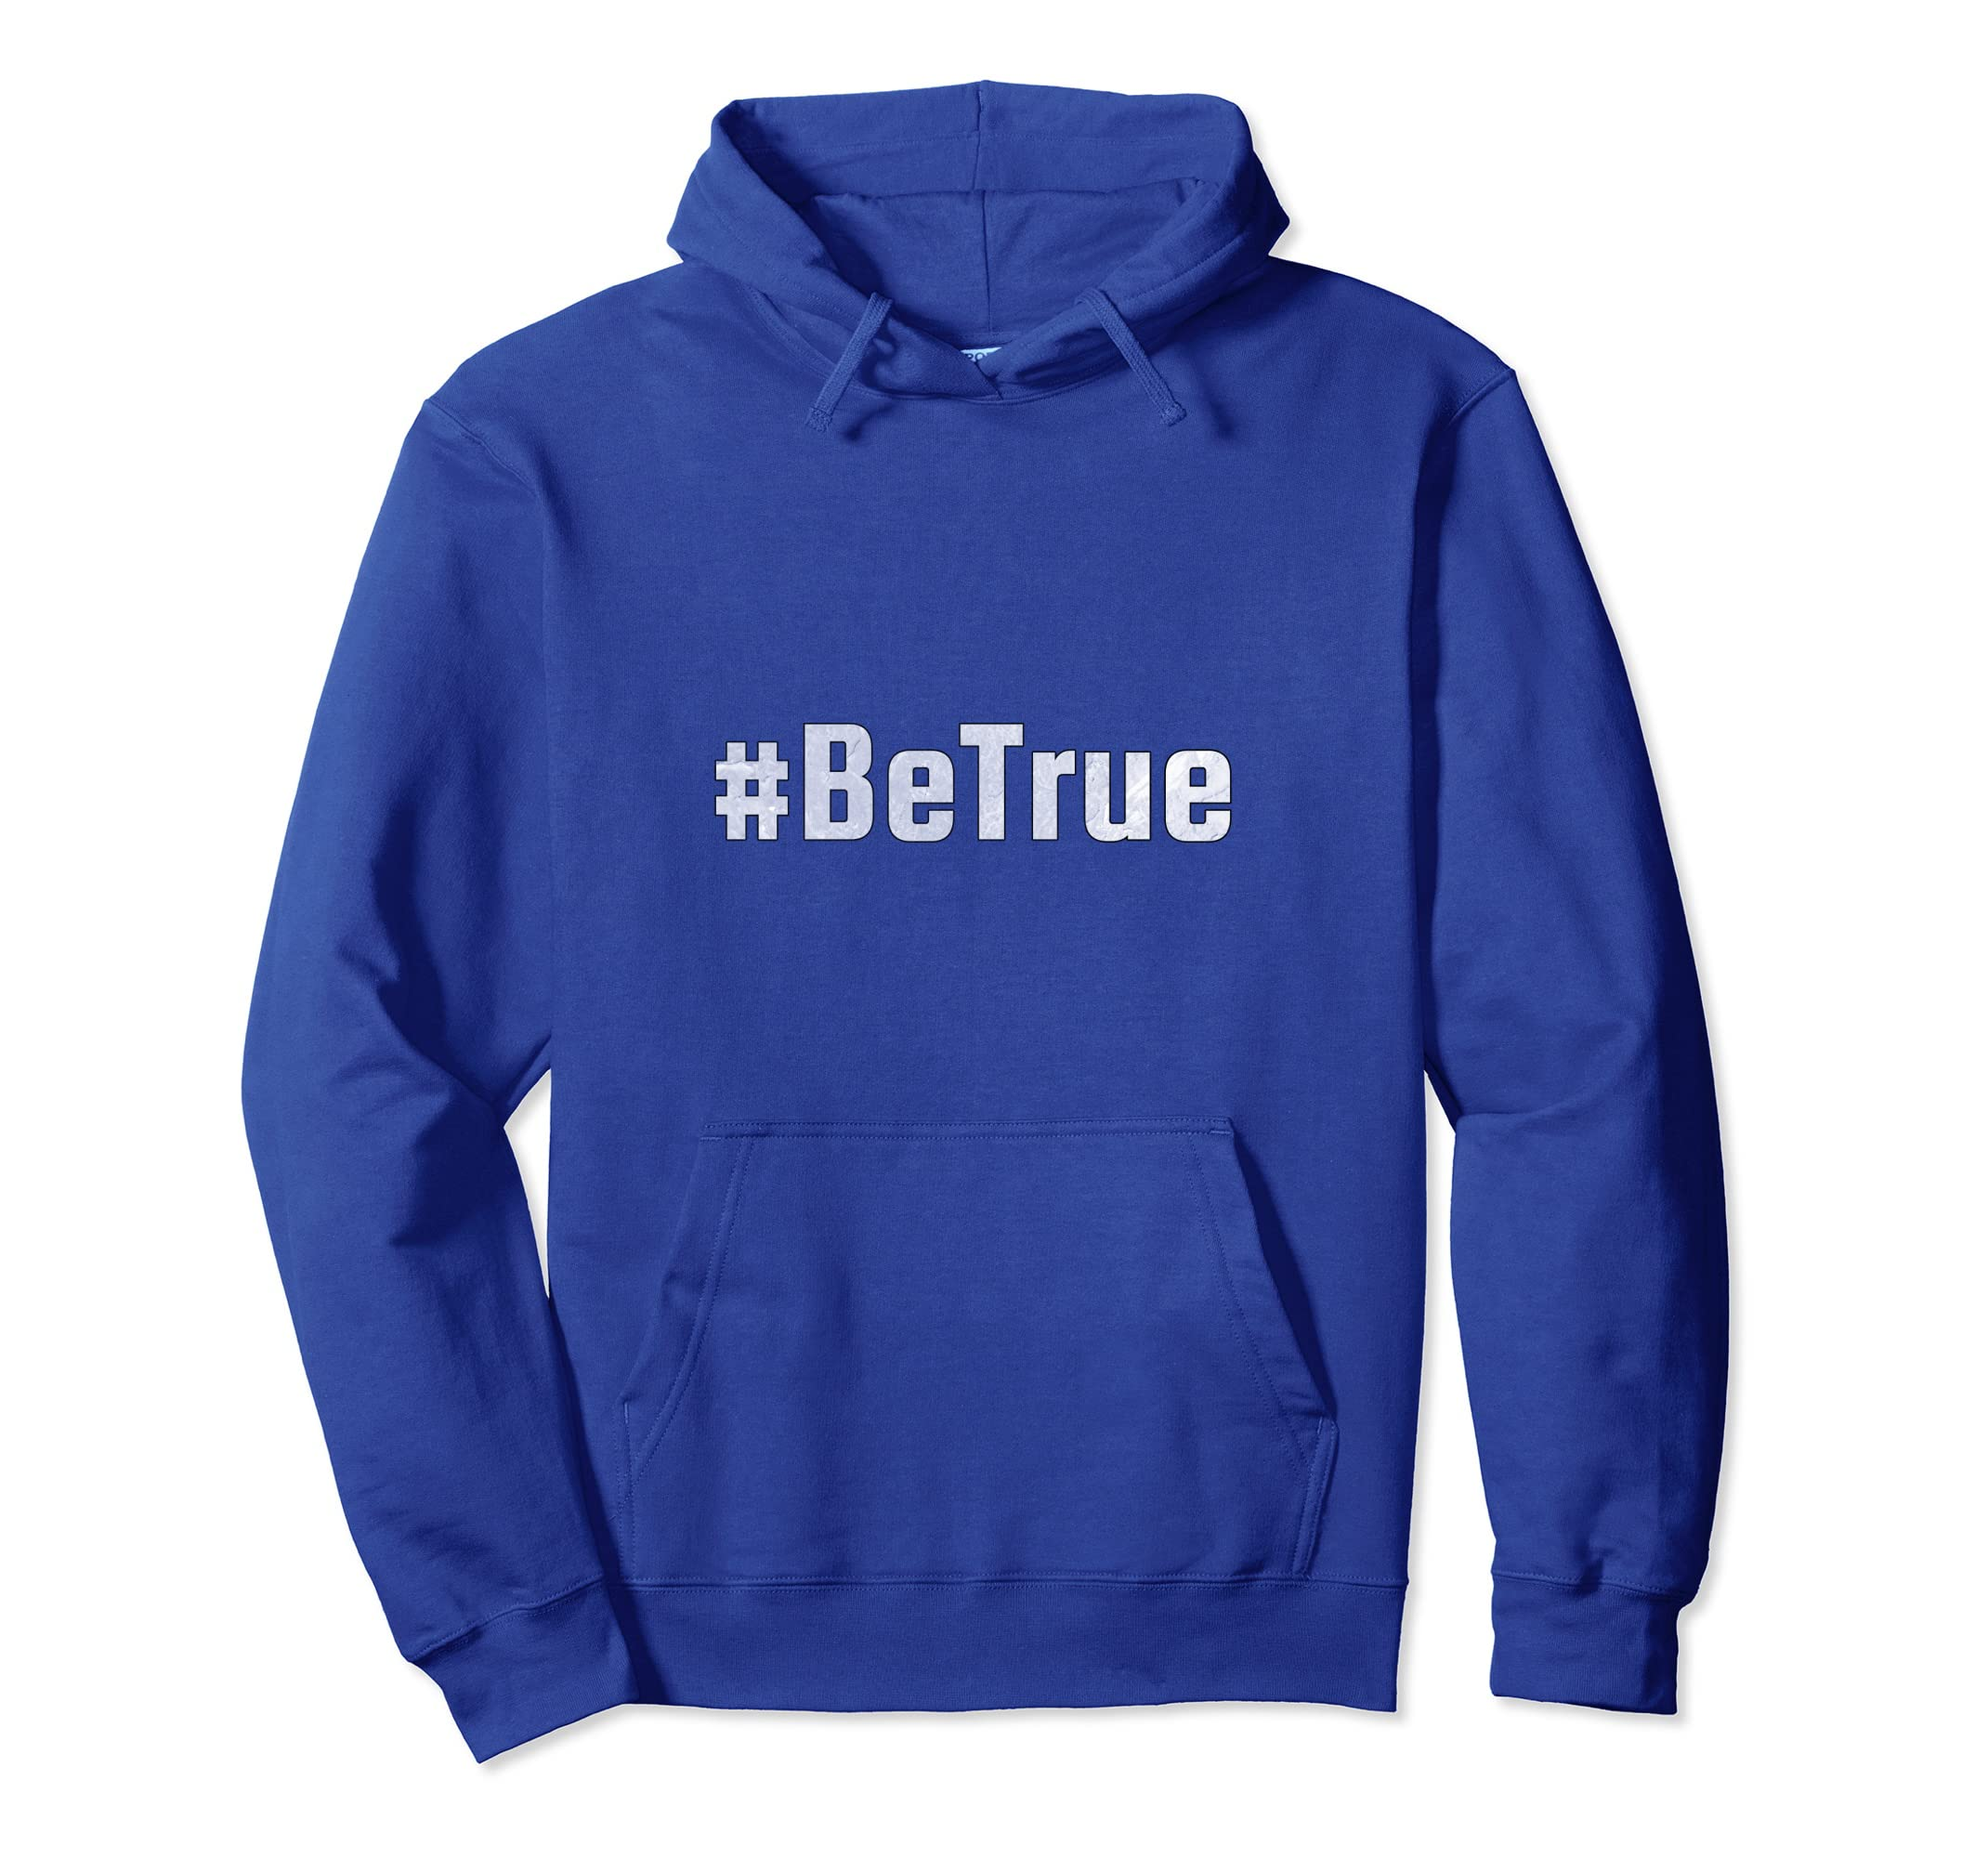 #BeTrue Be True Hashtag Positive Hoodie-SFL